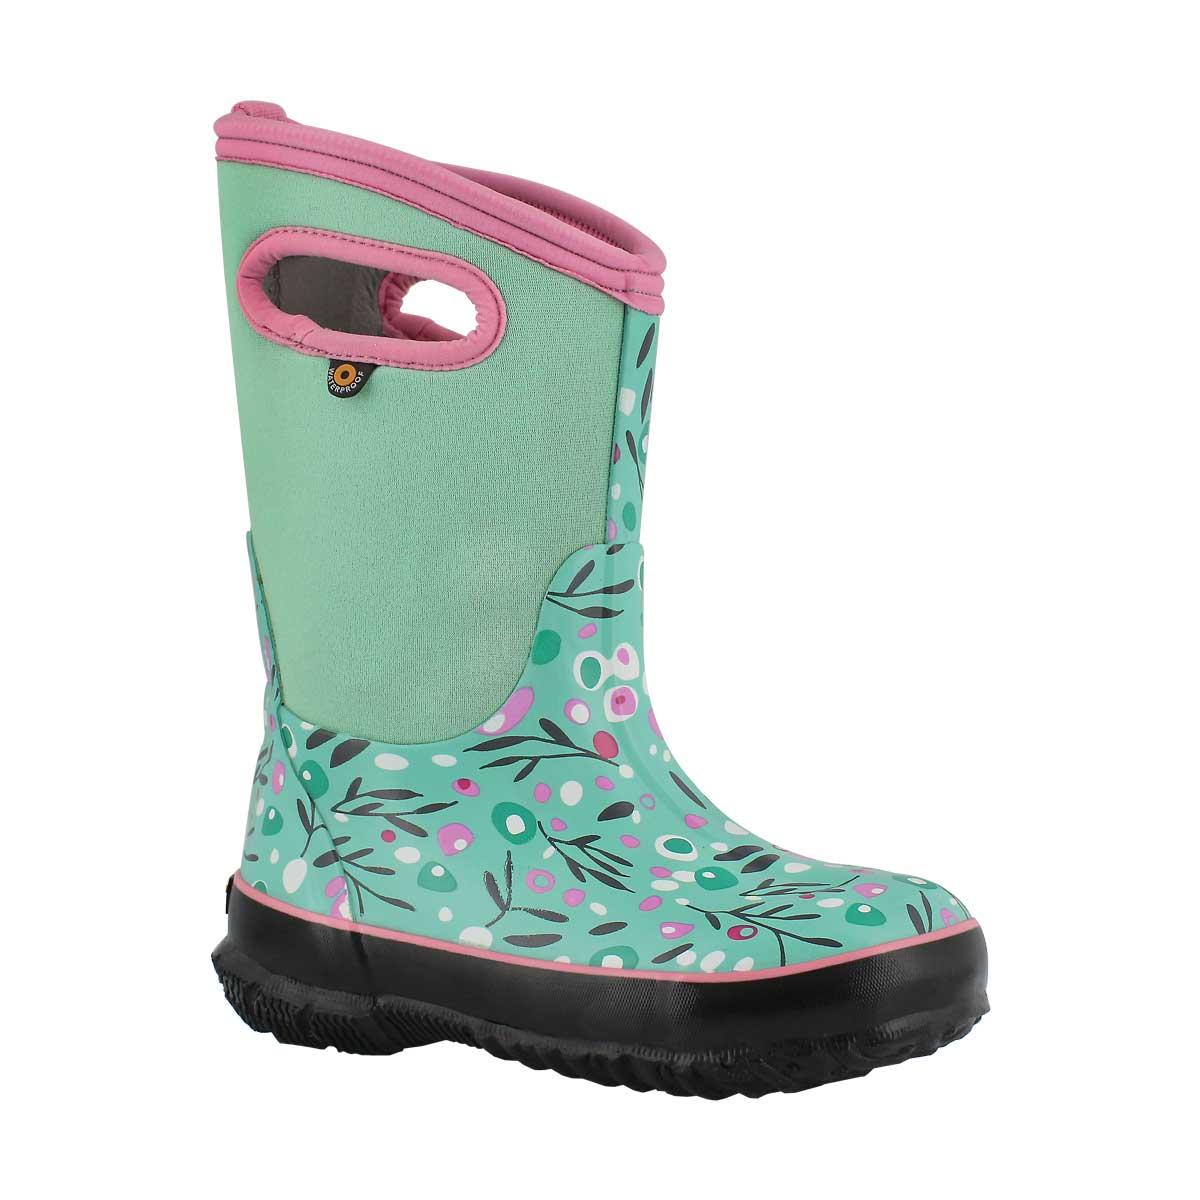 Girls' CLASSIC CATTAIL mint multi waterproof boots